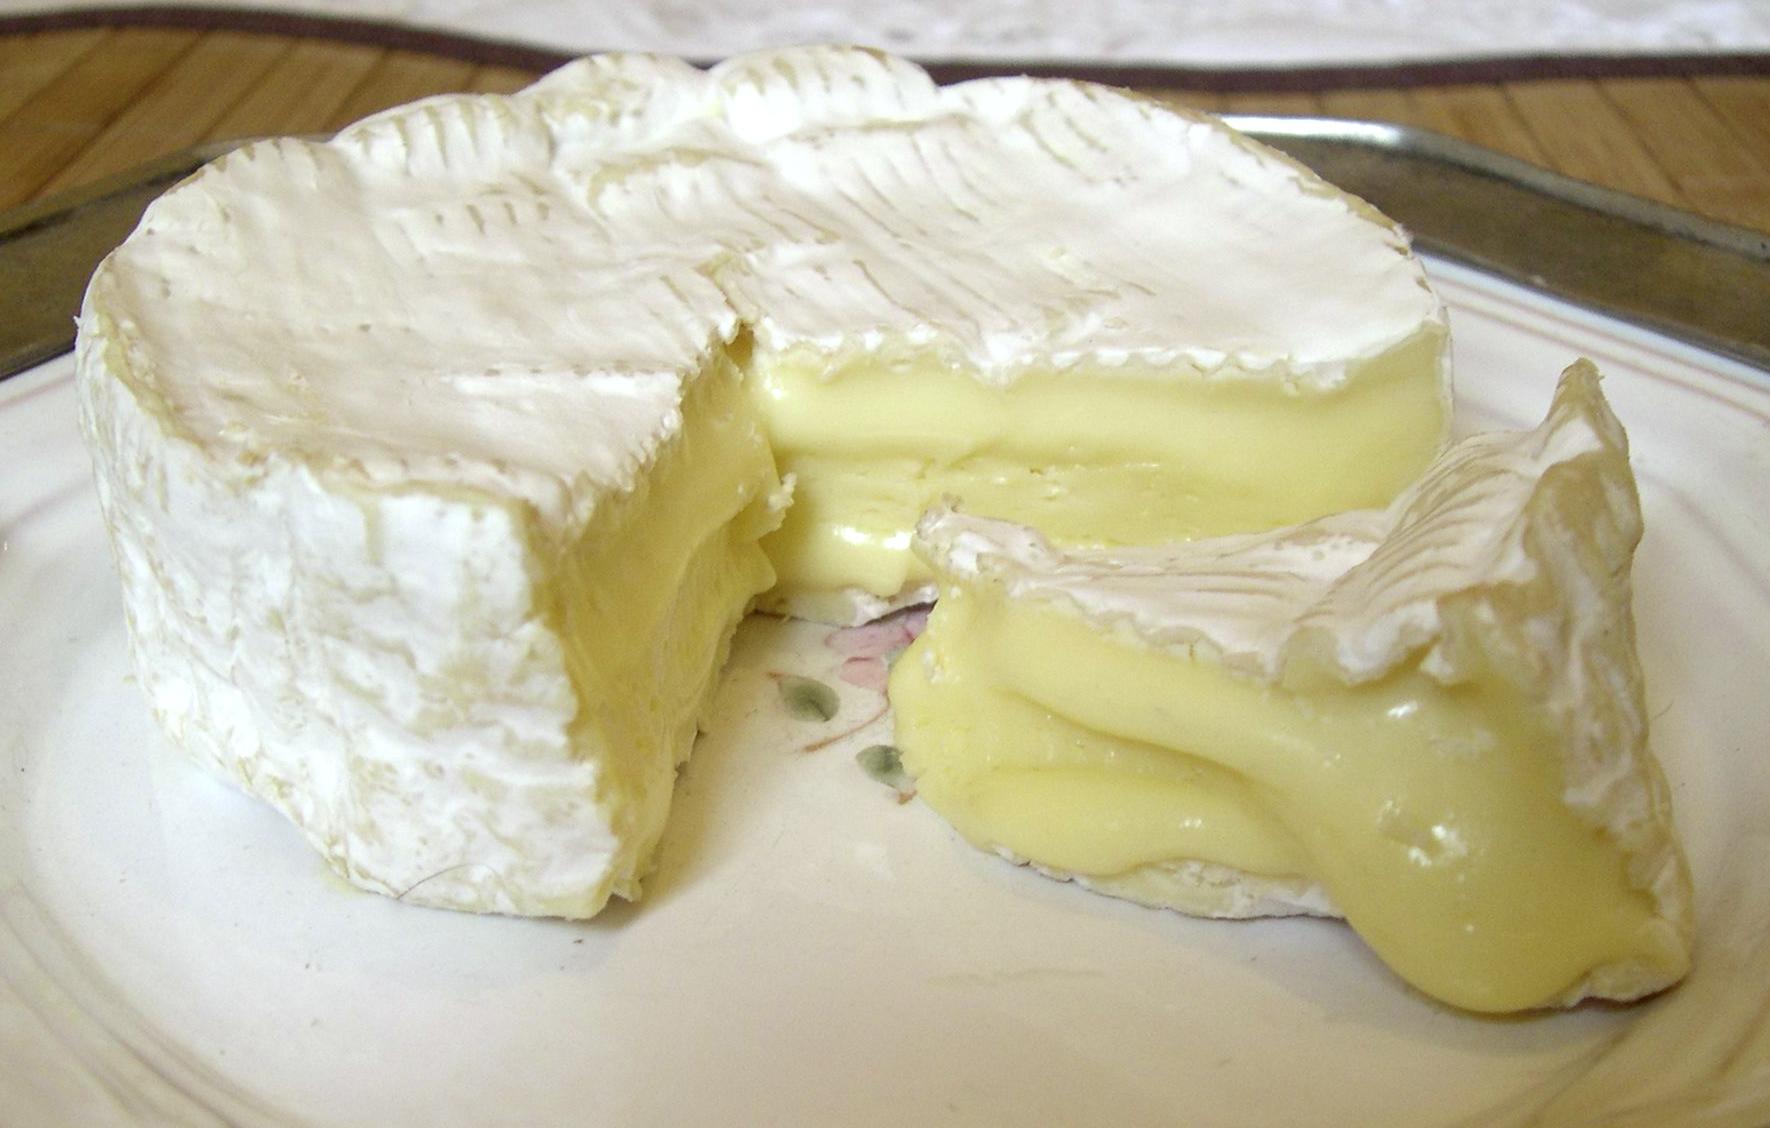 File:Camembert.JPG - Wikimedia Commons